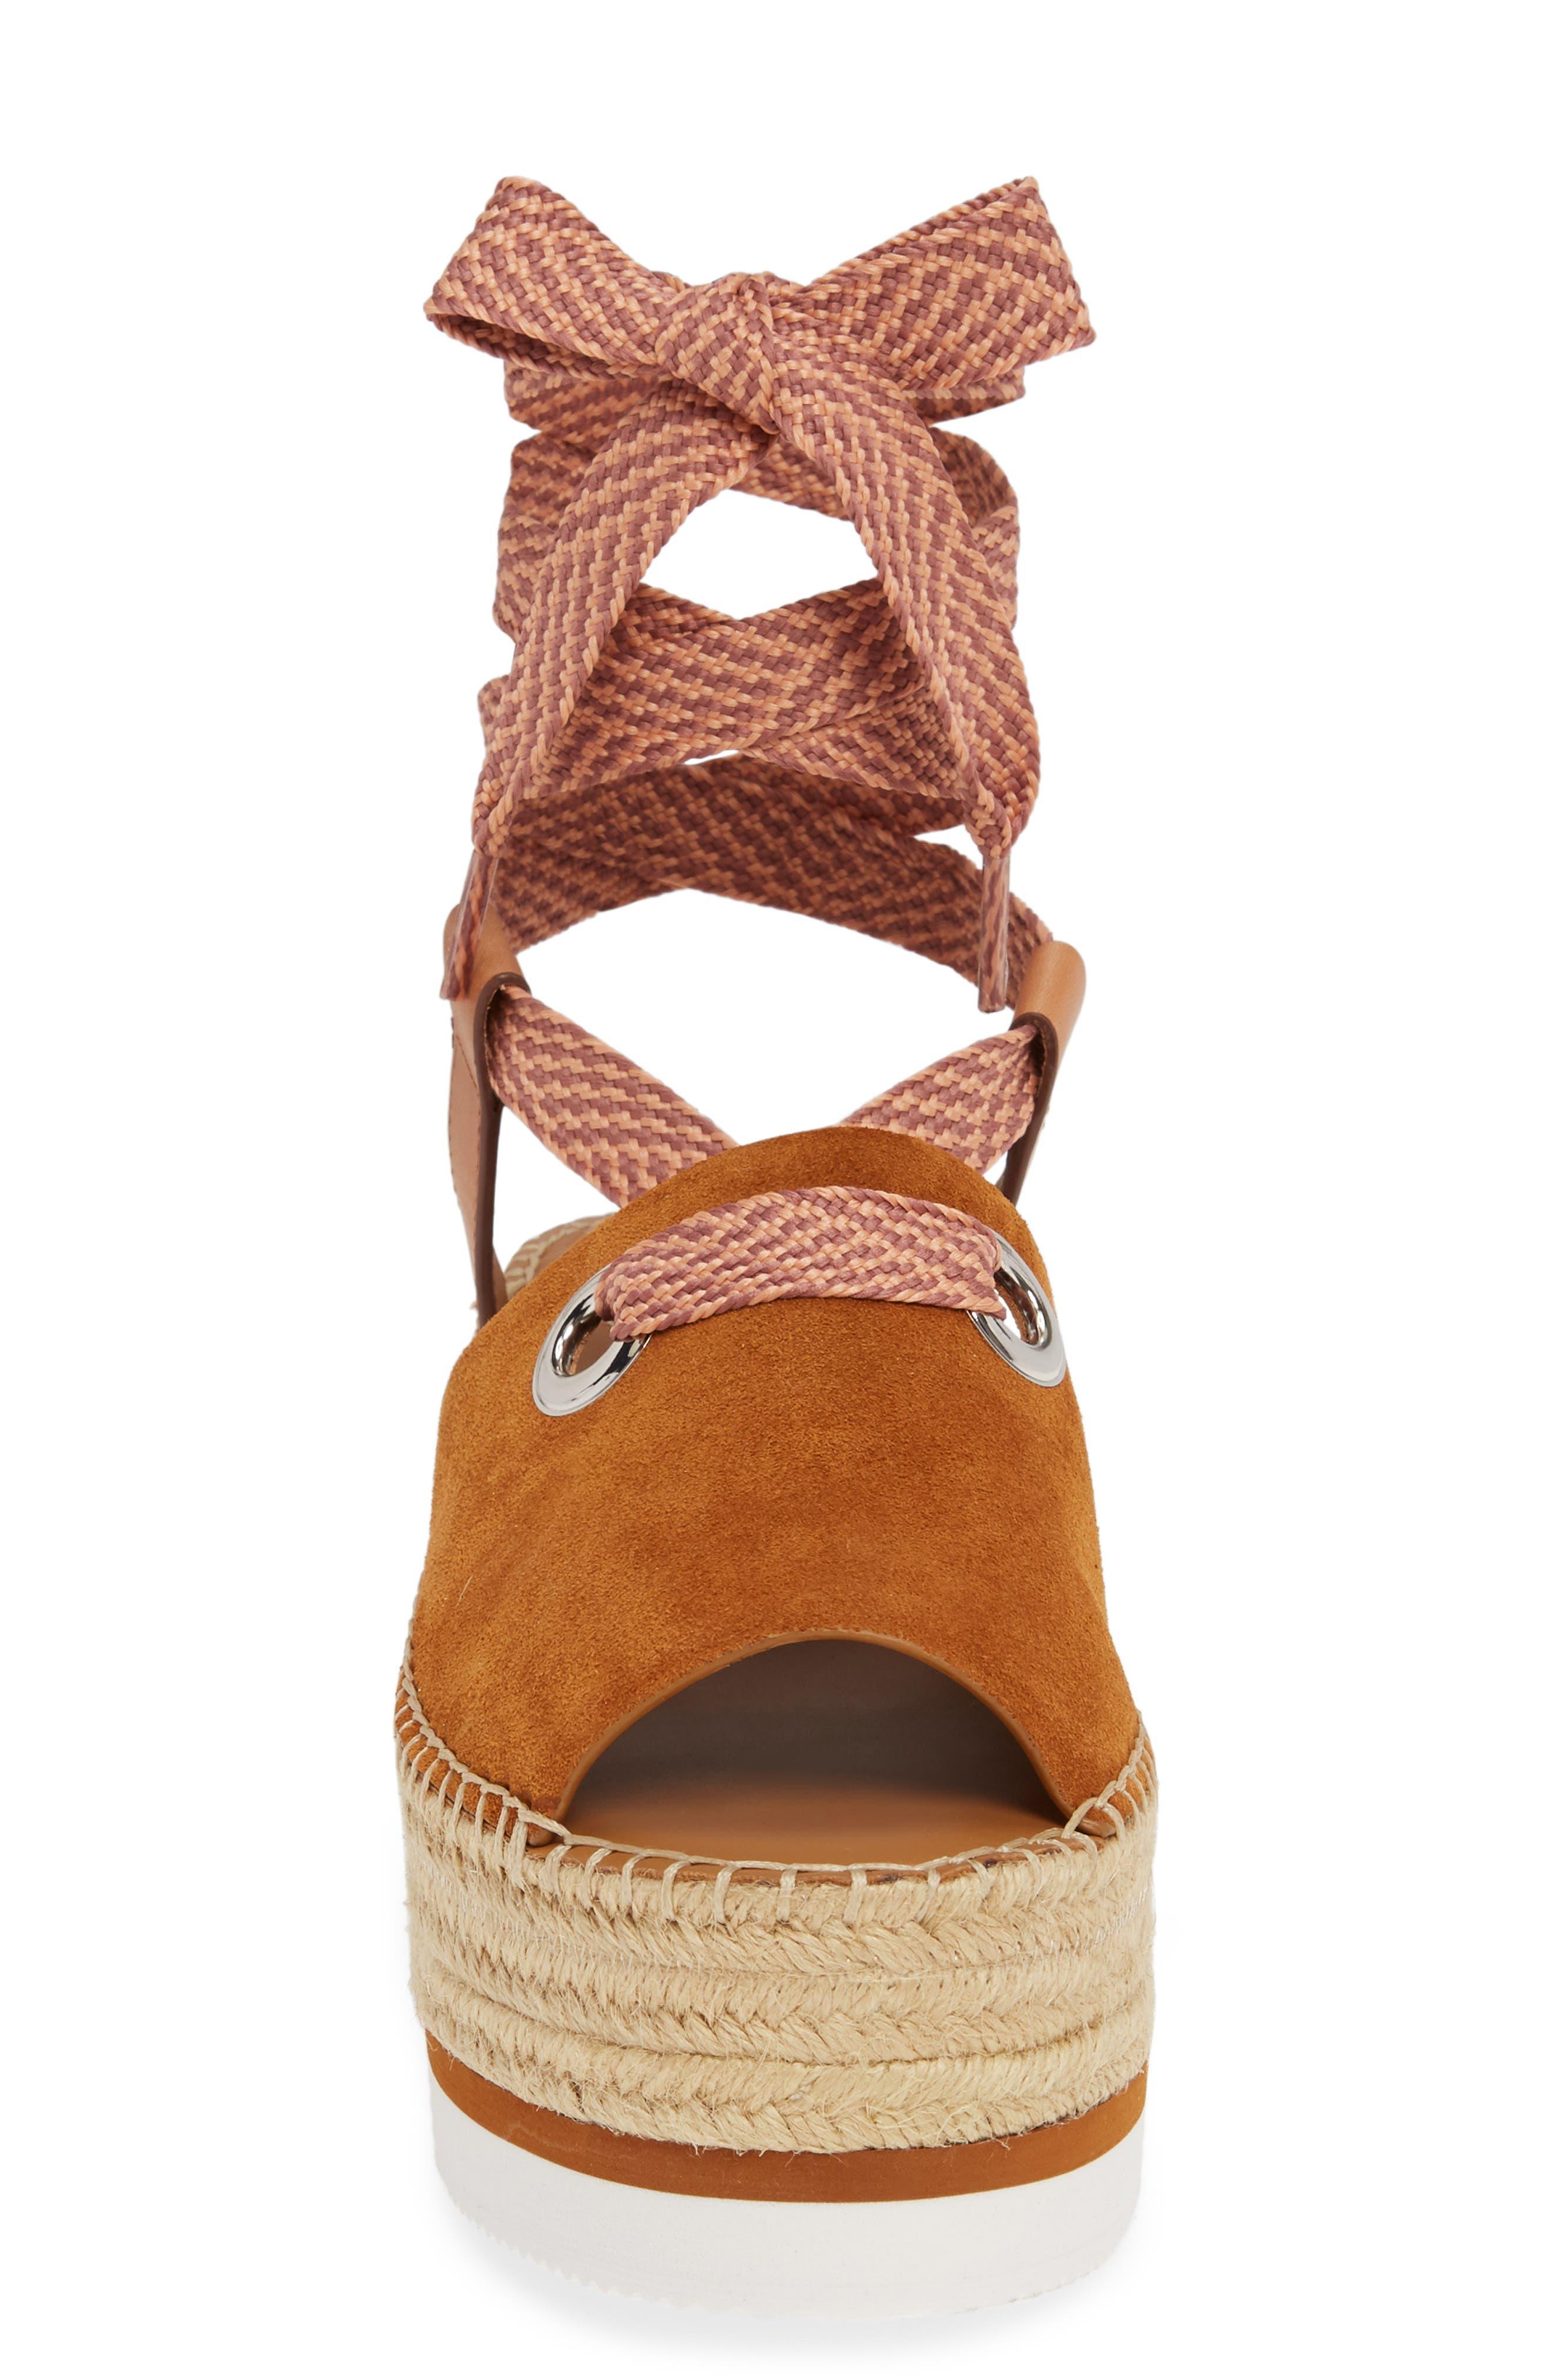 Glyn Amber Platform Ankle Wrap Sandal,                             Alternate thumbnail 4, color,                             TAN